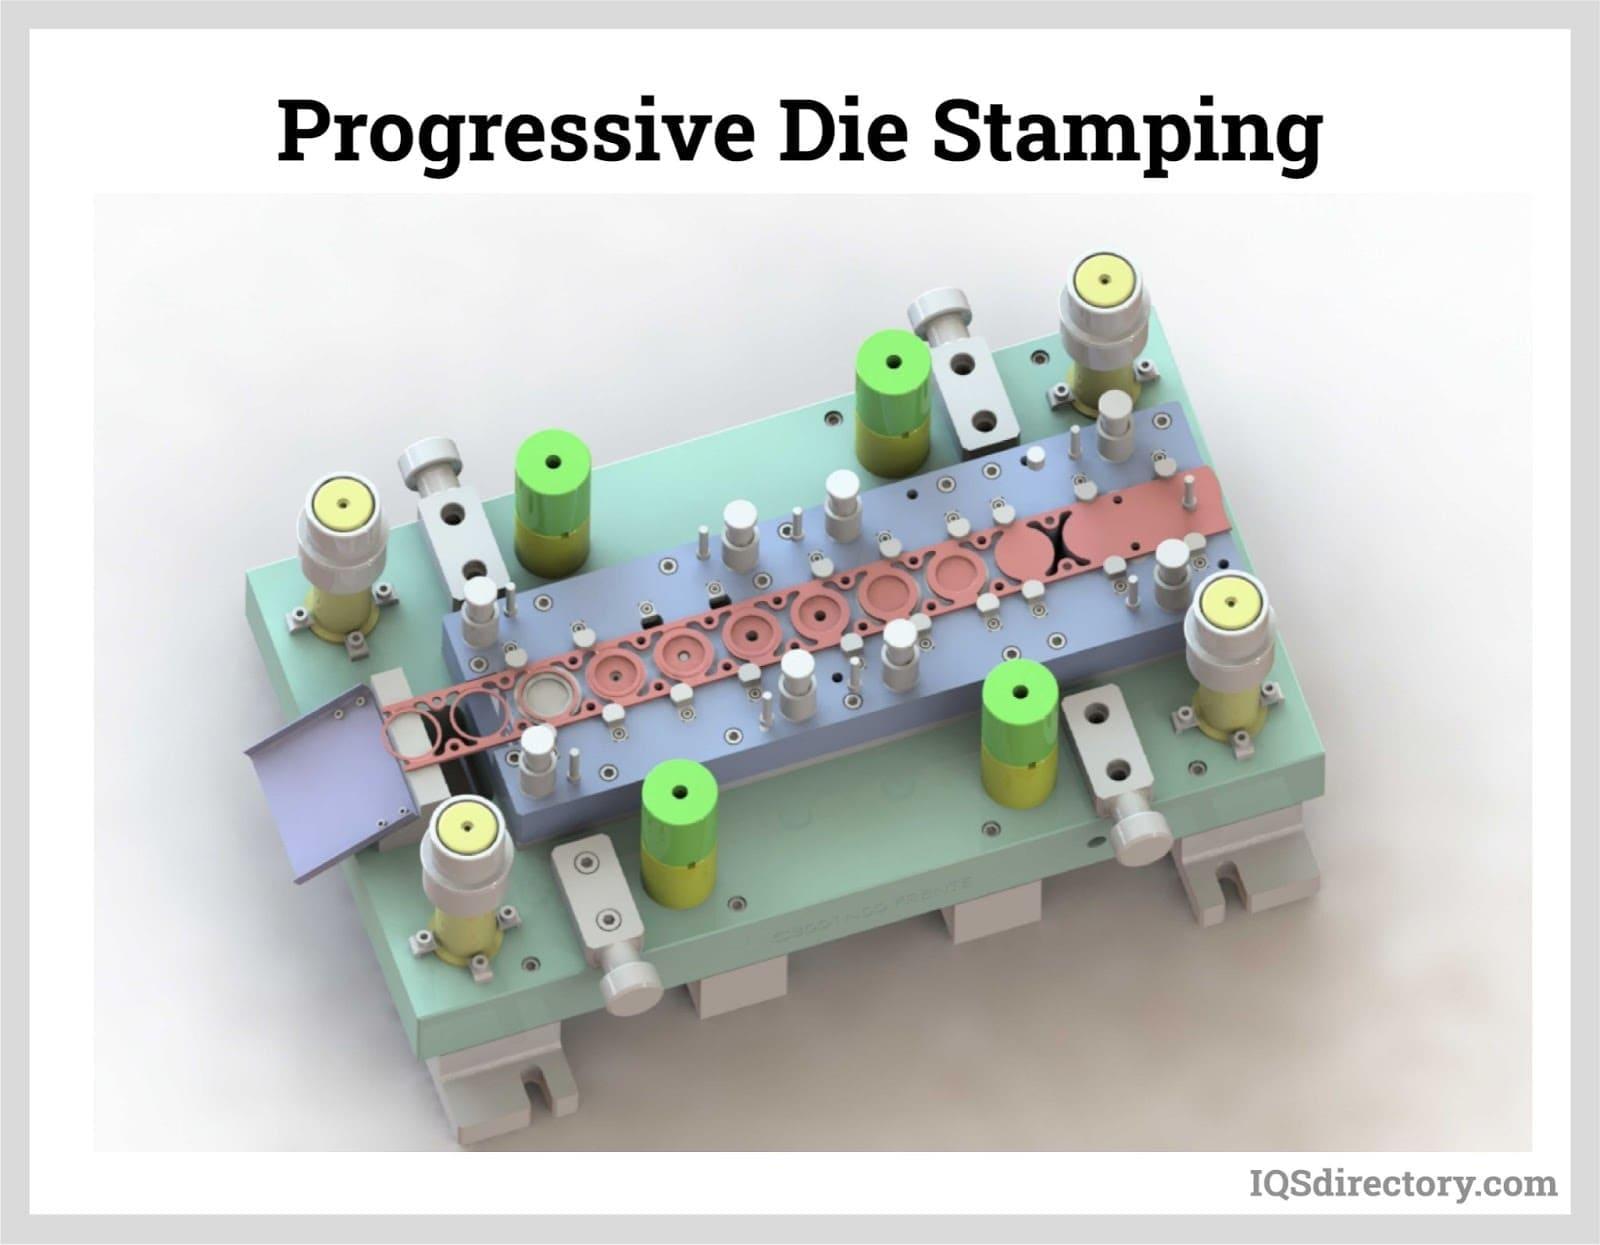 Progressive Die Stamping